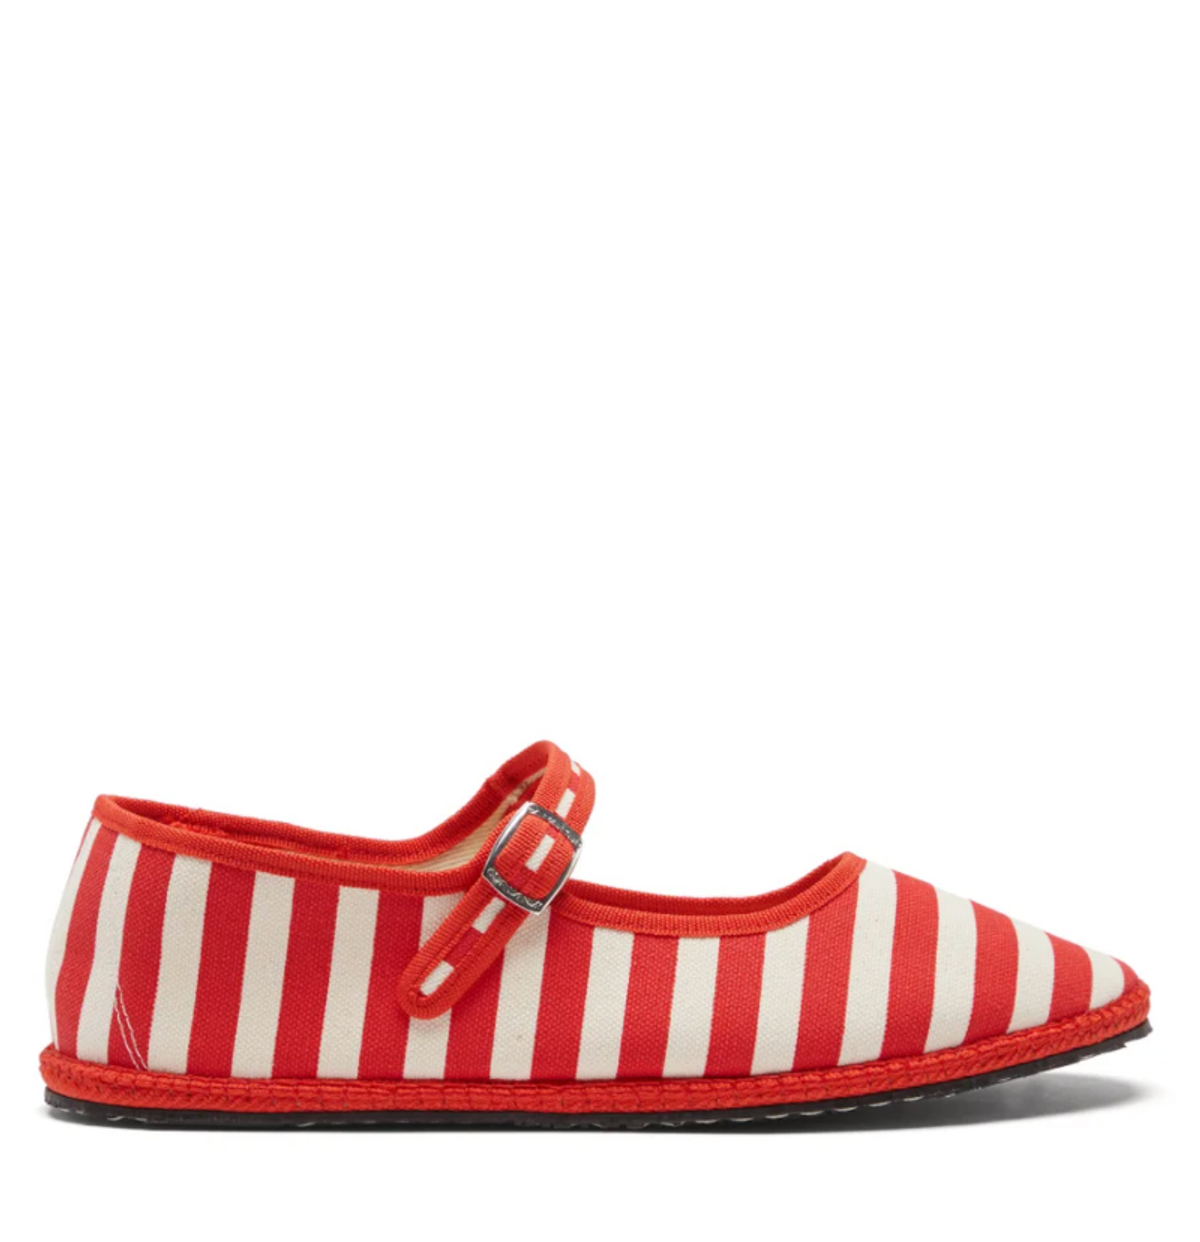 Striped Canvas Mary Jane Flats